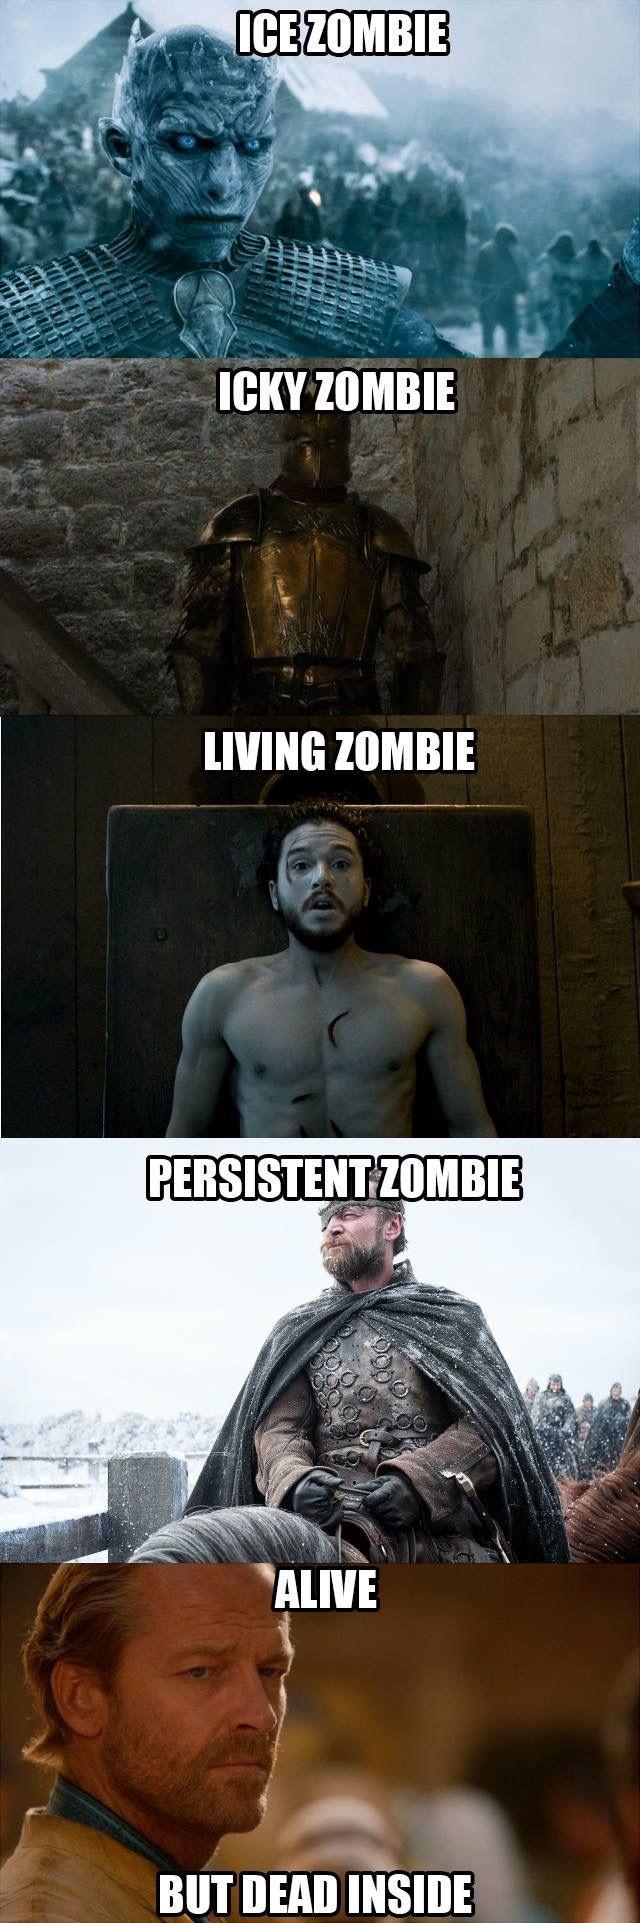 Photo of Game of Thrones Lustig (32) – XD l Lustige Bilder Videos Meme Gamer Spiele Zitat …